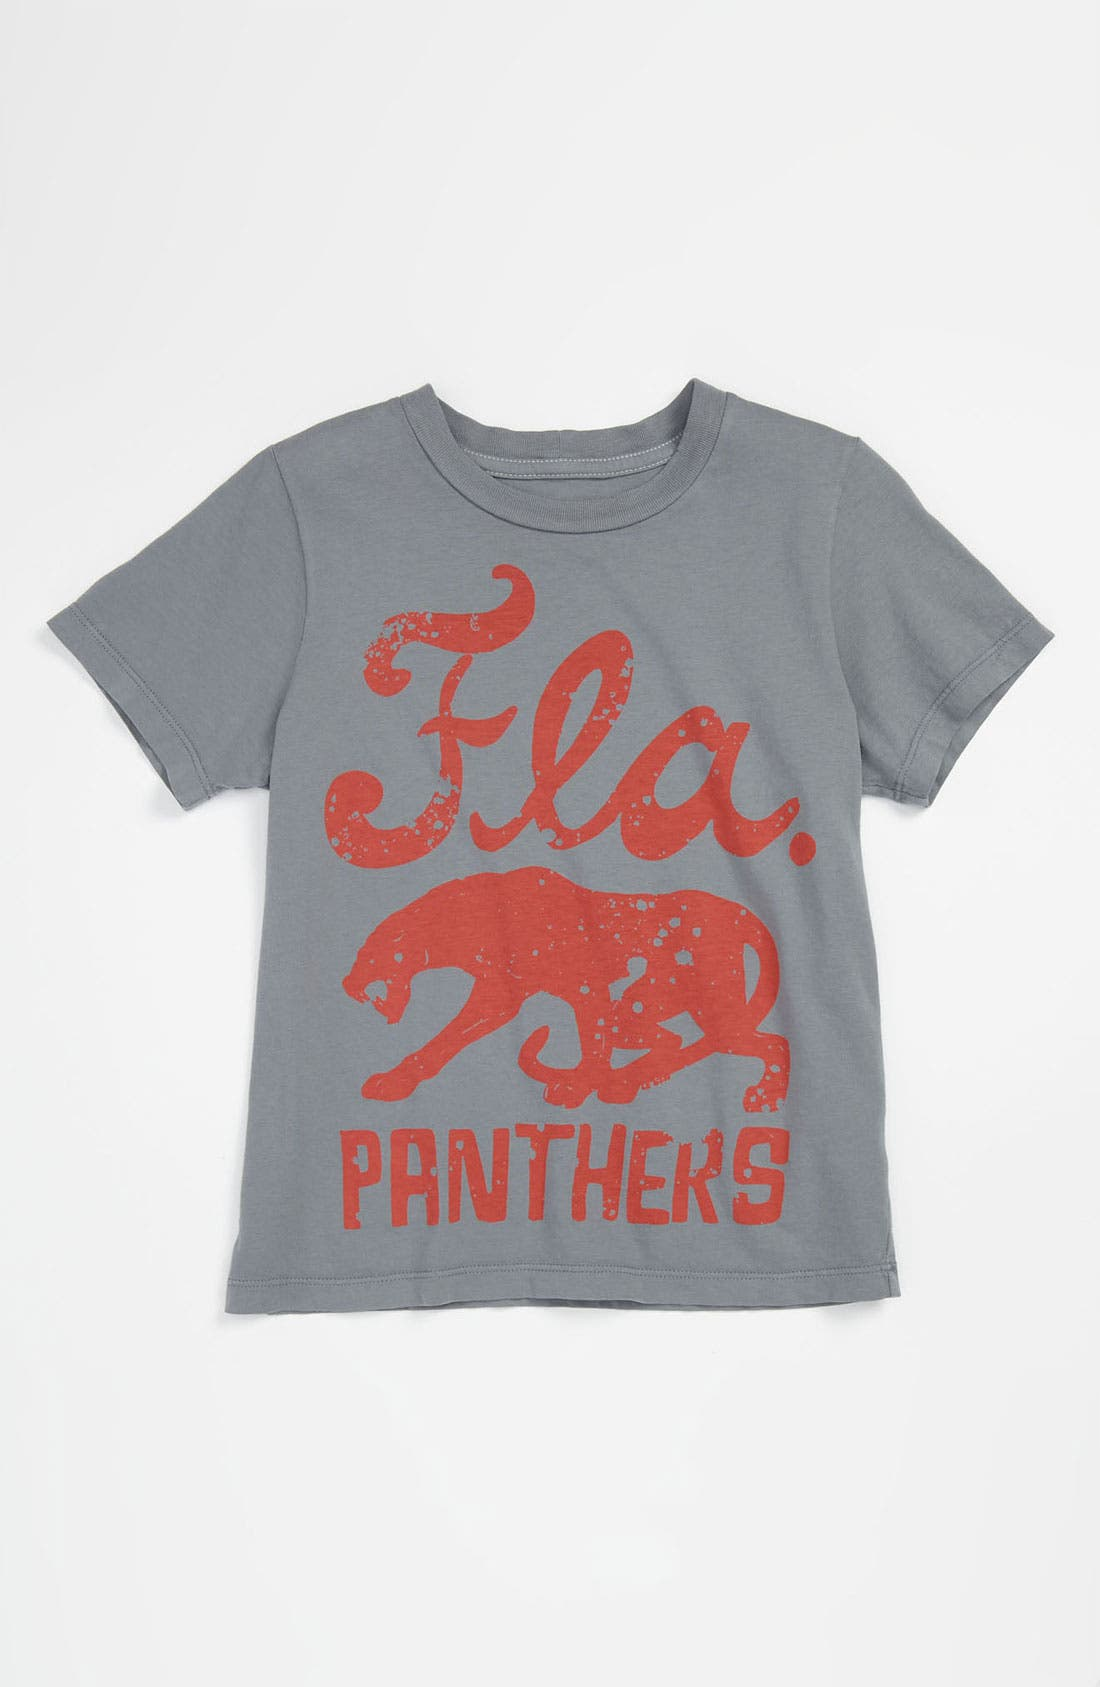 Alternate Image 1 Selected - Peek 'Florida Panthers' T-Shirt (Toddler, Little Boys & Big Boys)